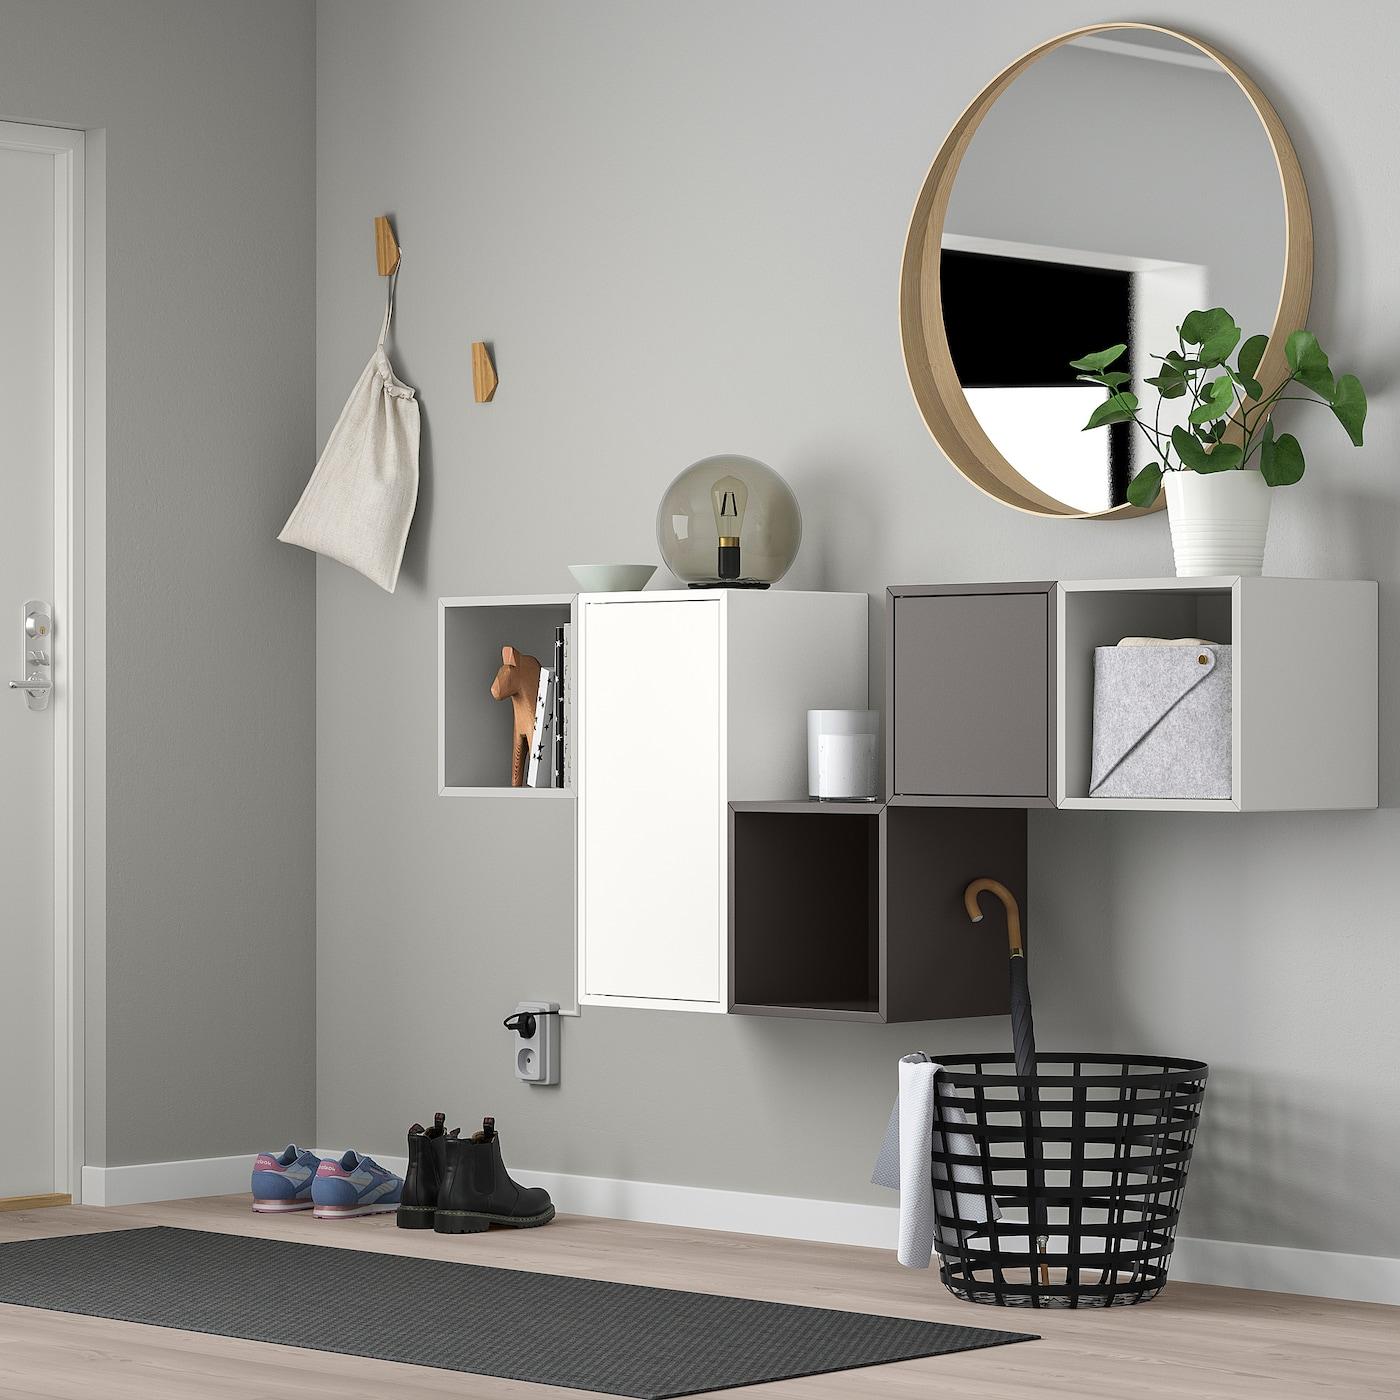 EKET تشكيلة خزانة حائطية, أبيض/رمادي فاتح/رمادي غامق, 175x35x70 سم